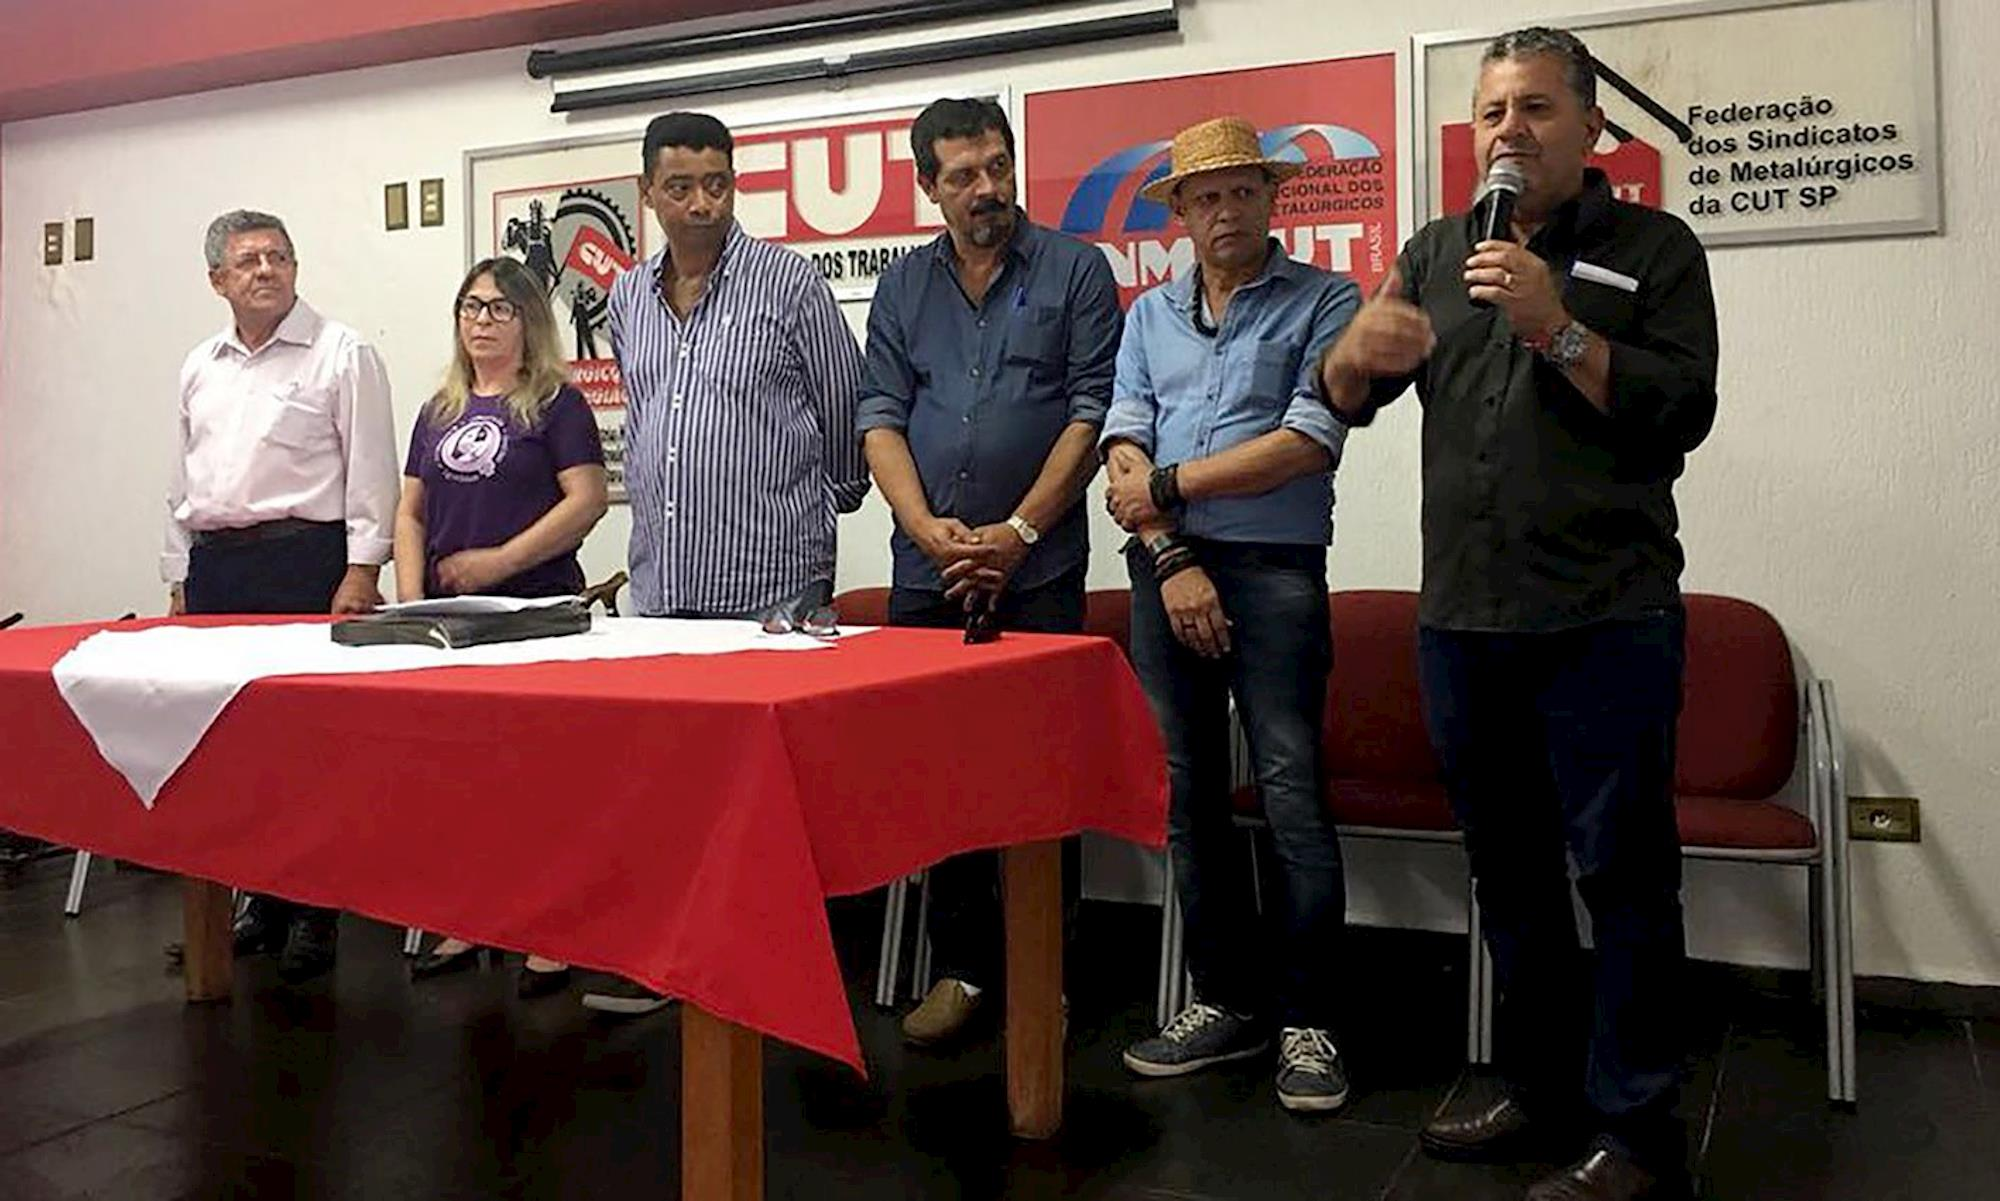 sindicato, itu, posse, Divulgação